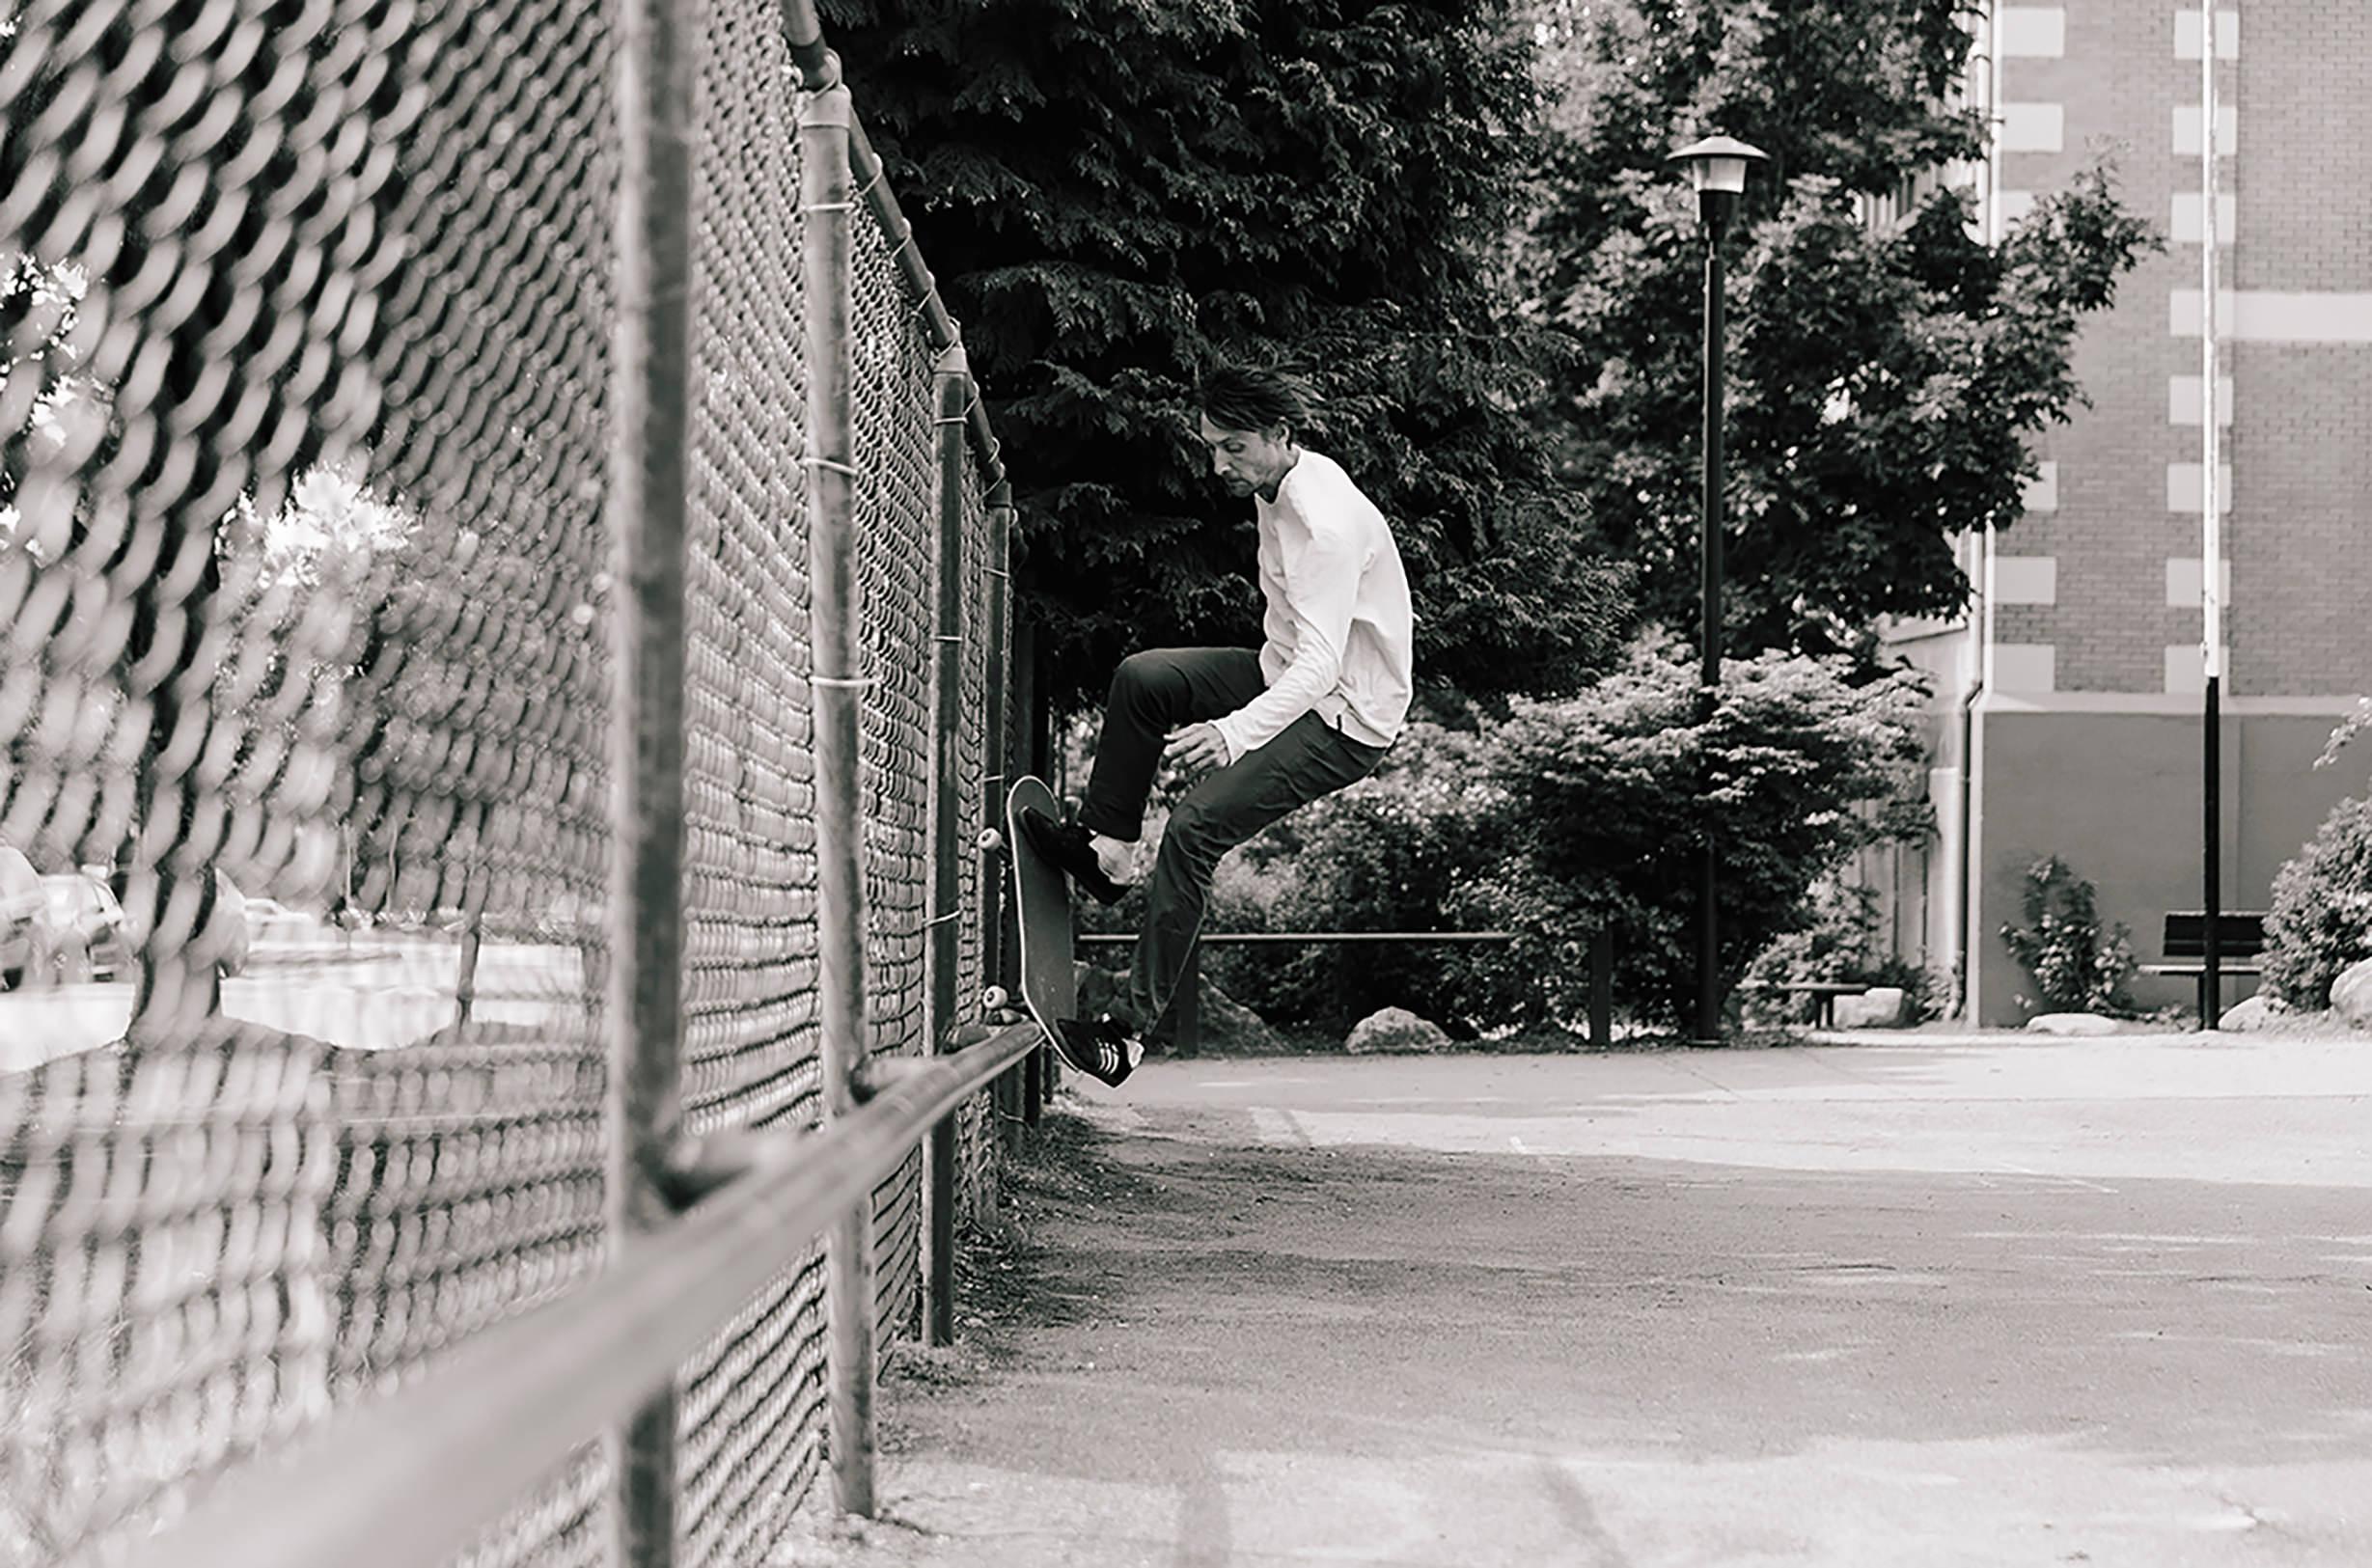 57c3dad5d83d9bd4568f1be2_livestock-x-adidas-samba-skateboard-2